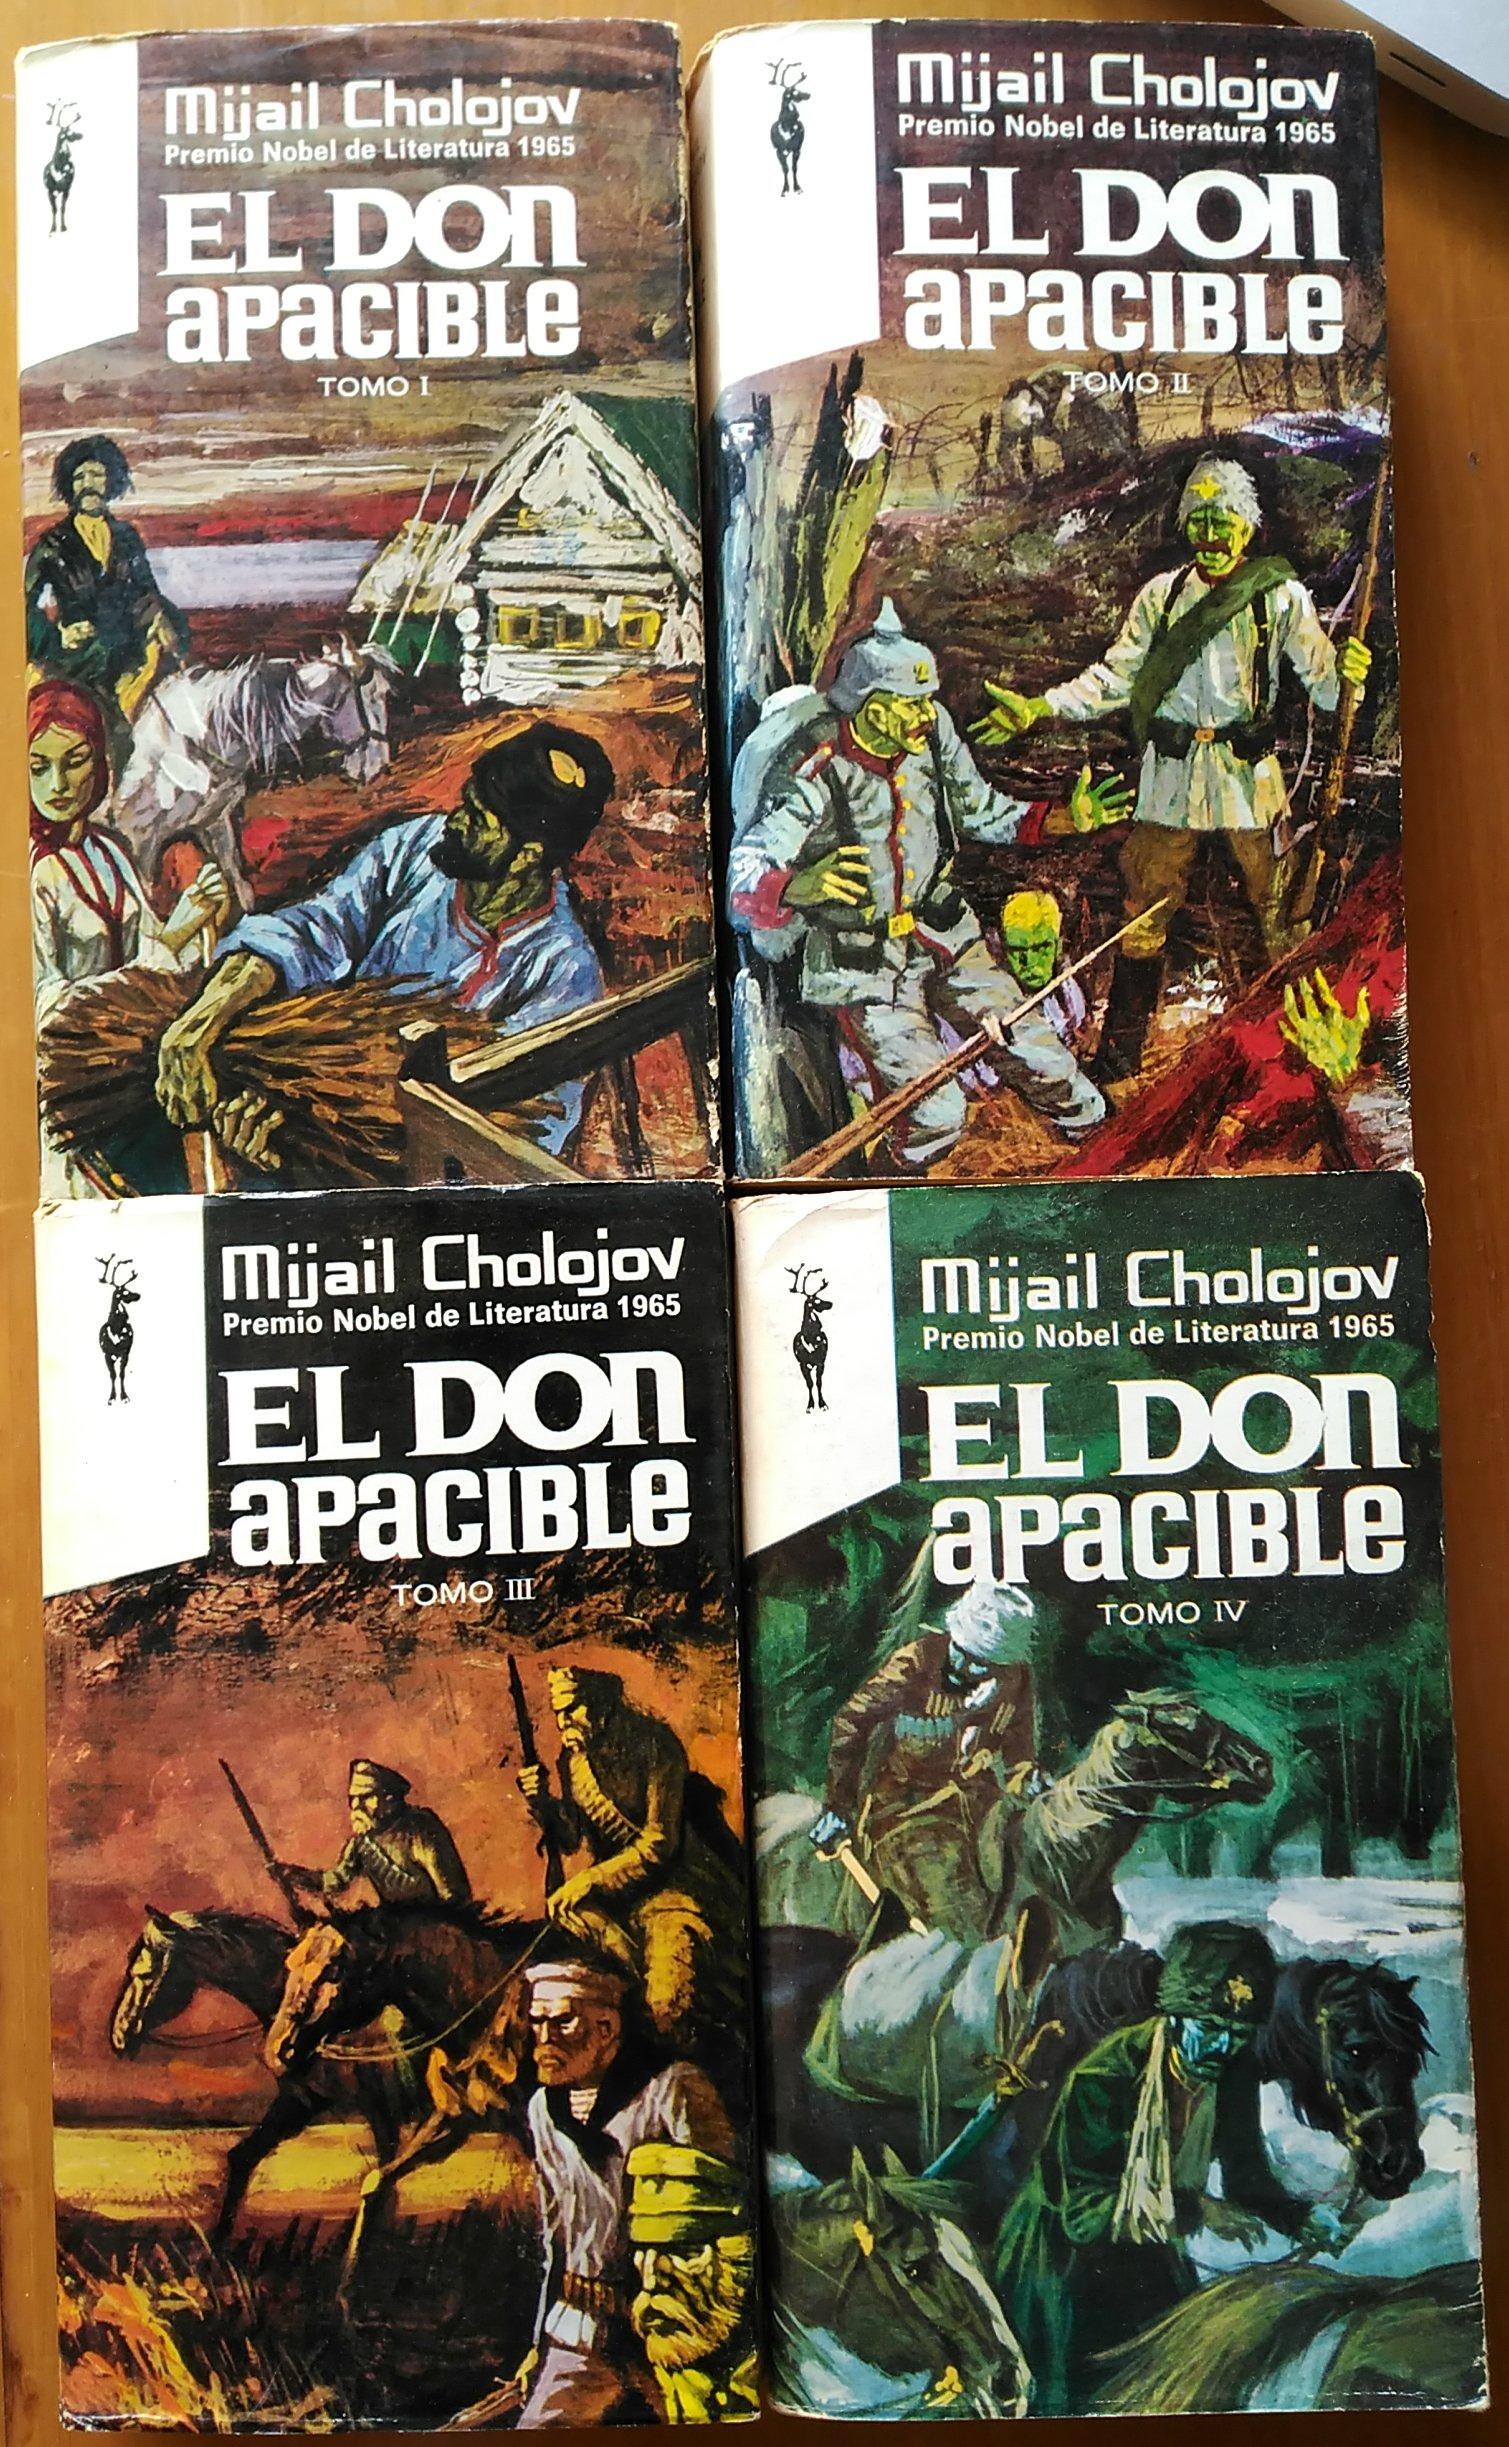 El don apacible.Tomo II: Amazon.es: Mijail Cholojov ...